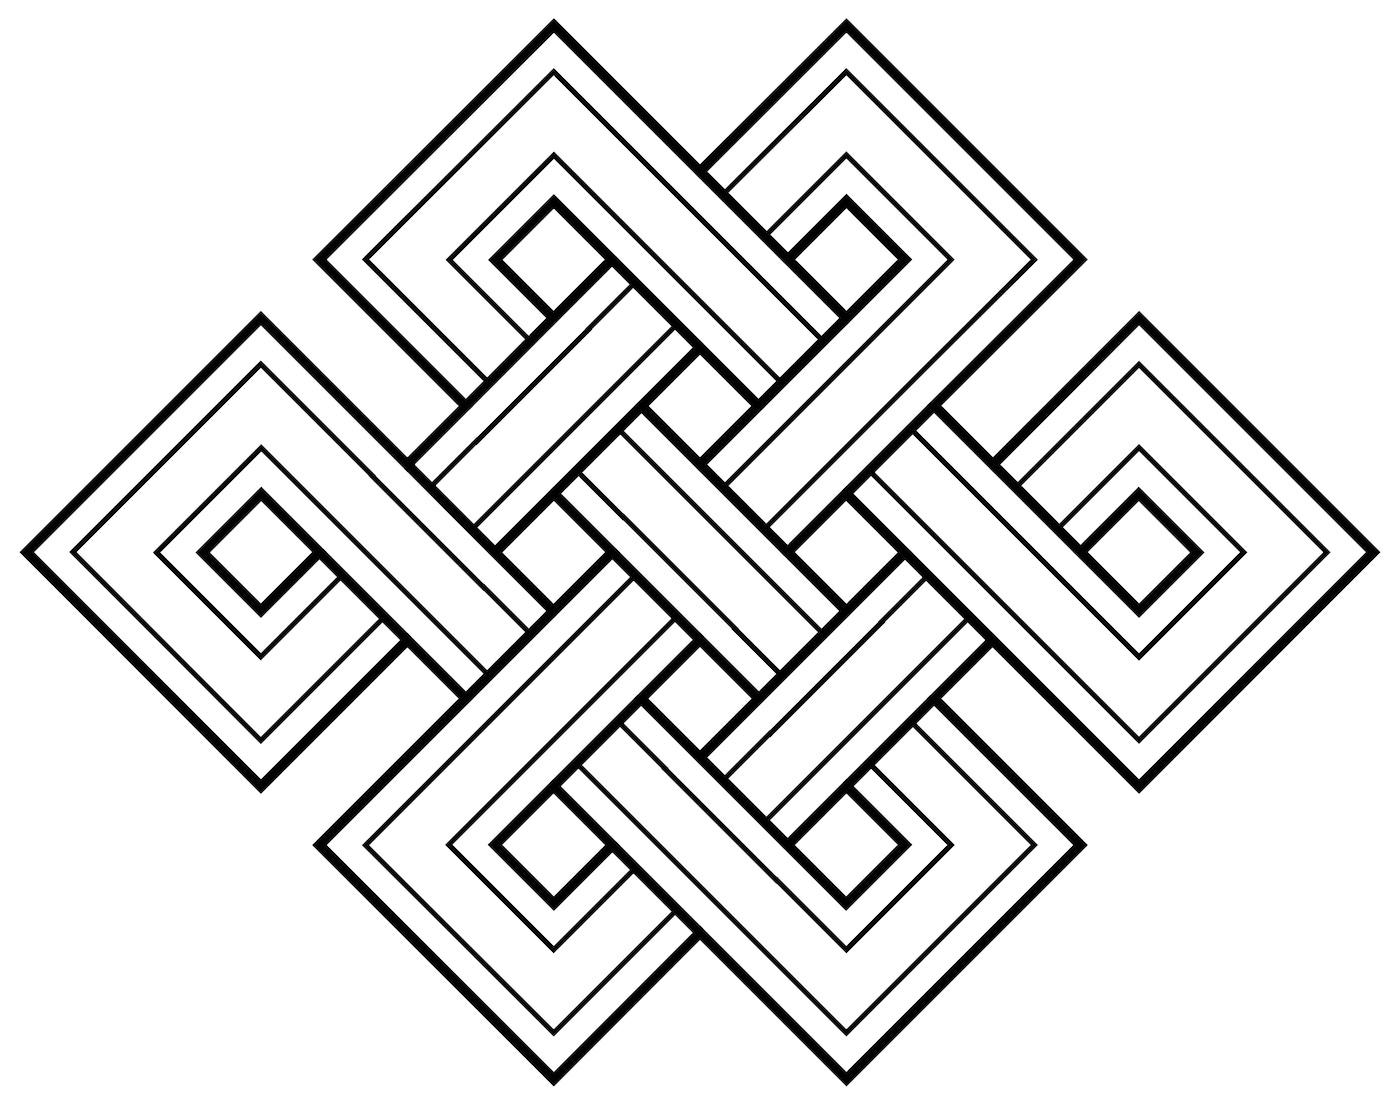 Buddhist Endless Knot symbol